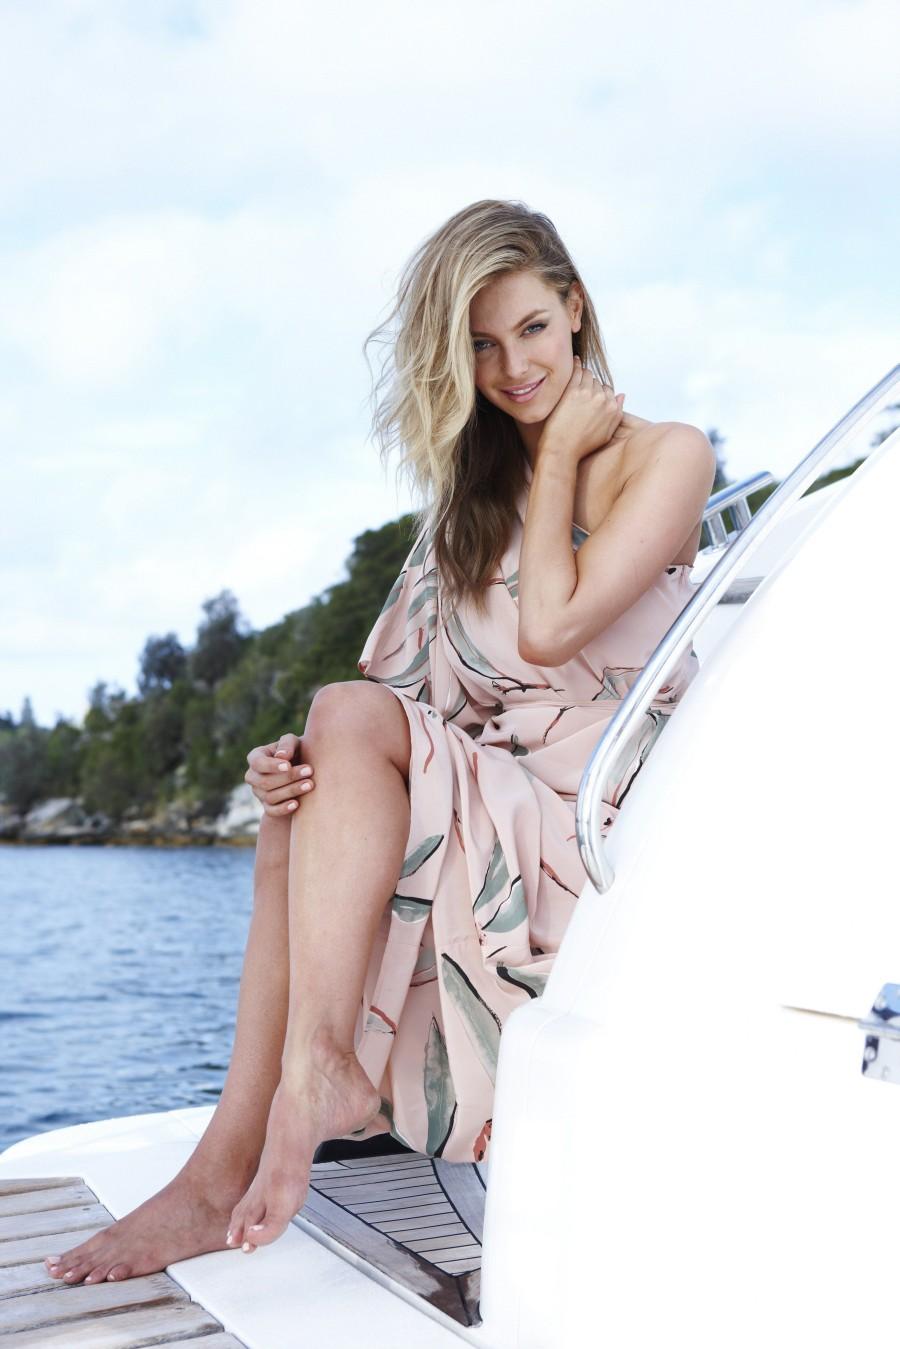 http://1.bp.blogspot.com/-yIPNlLYddDQ/Tz-qpAWsDYI/AAAAAAAALGA/bwAVSA-INTk/s1600/Jennifer+Hawkins+-+Sydney+Harbour+Photoshoot_11.jpg